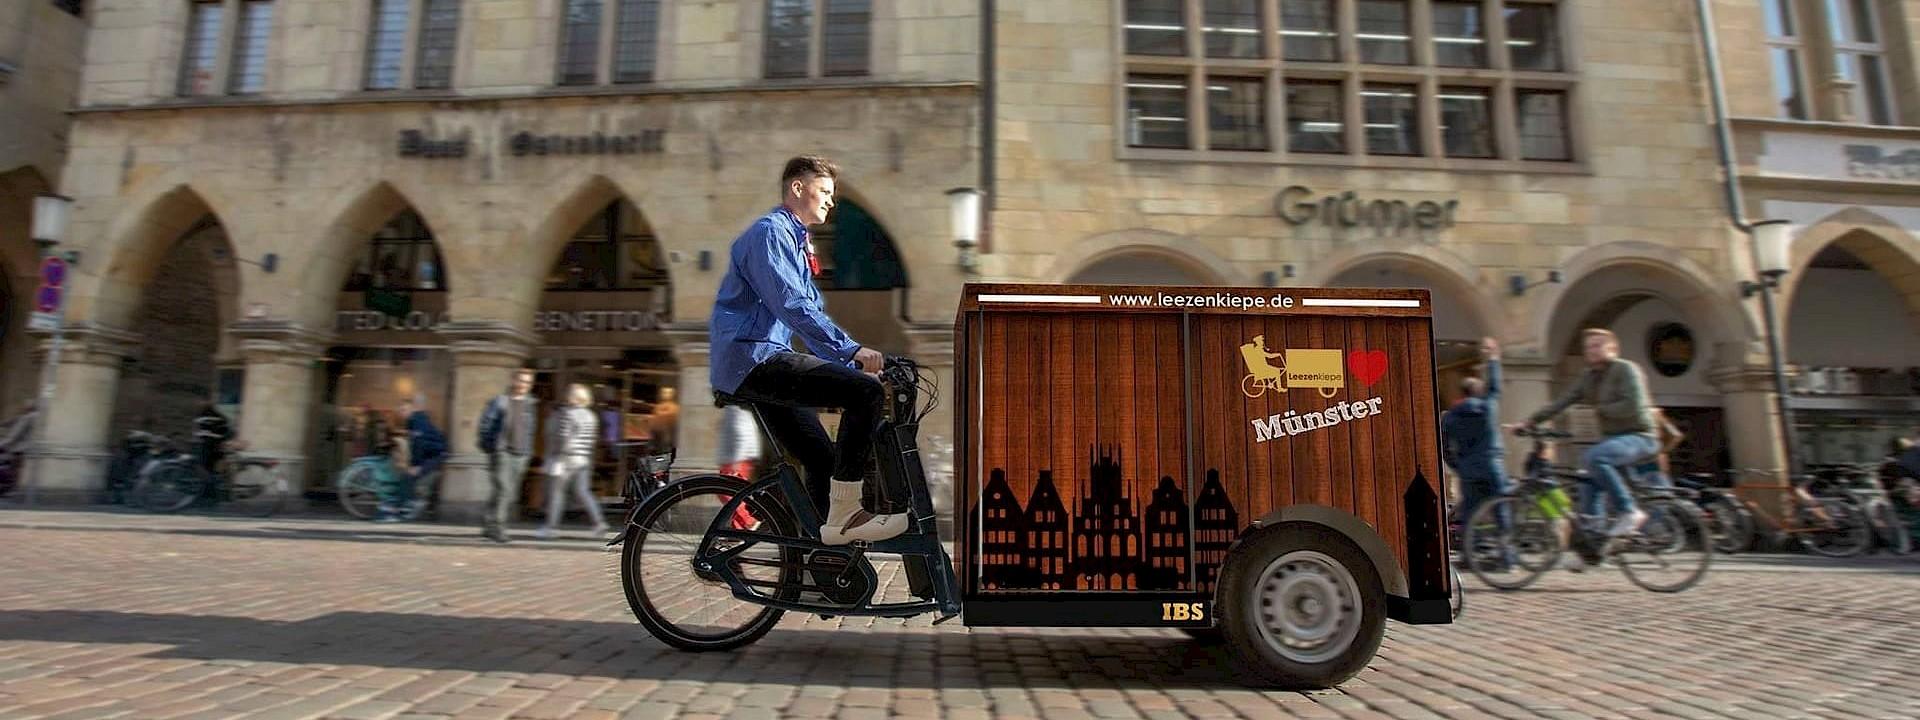 Lokalen Handel unterstützen Münster liefert